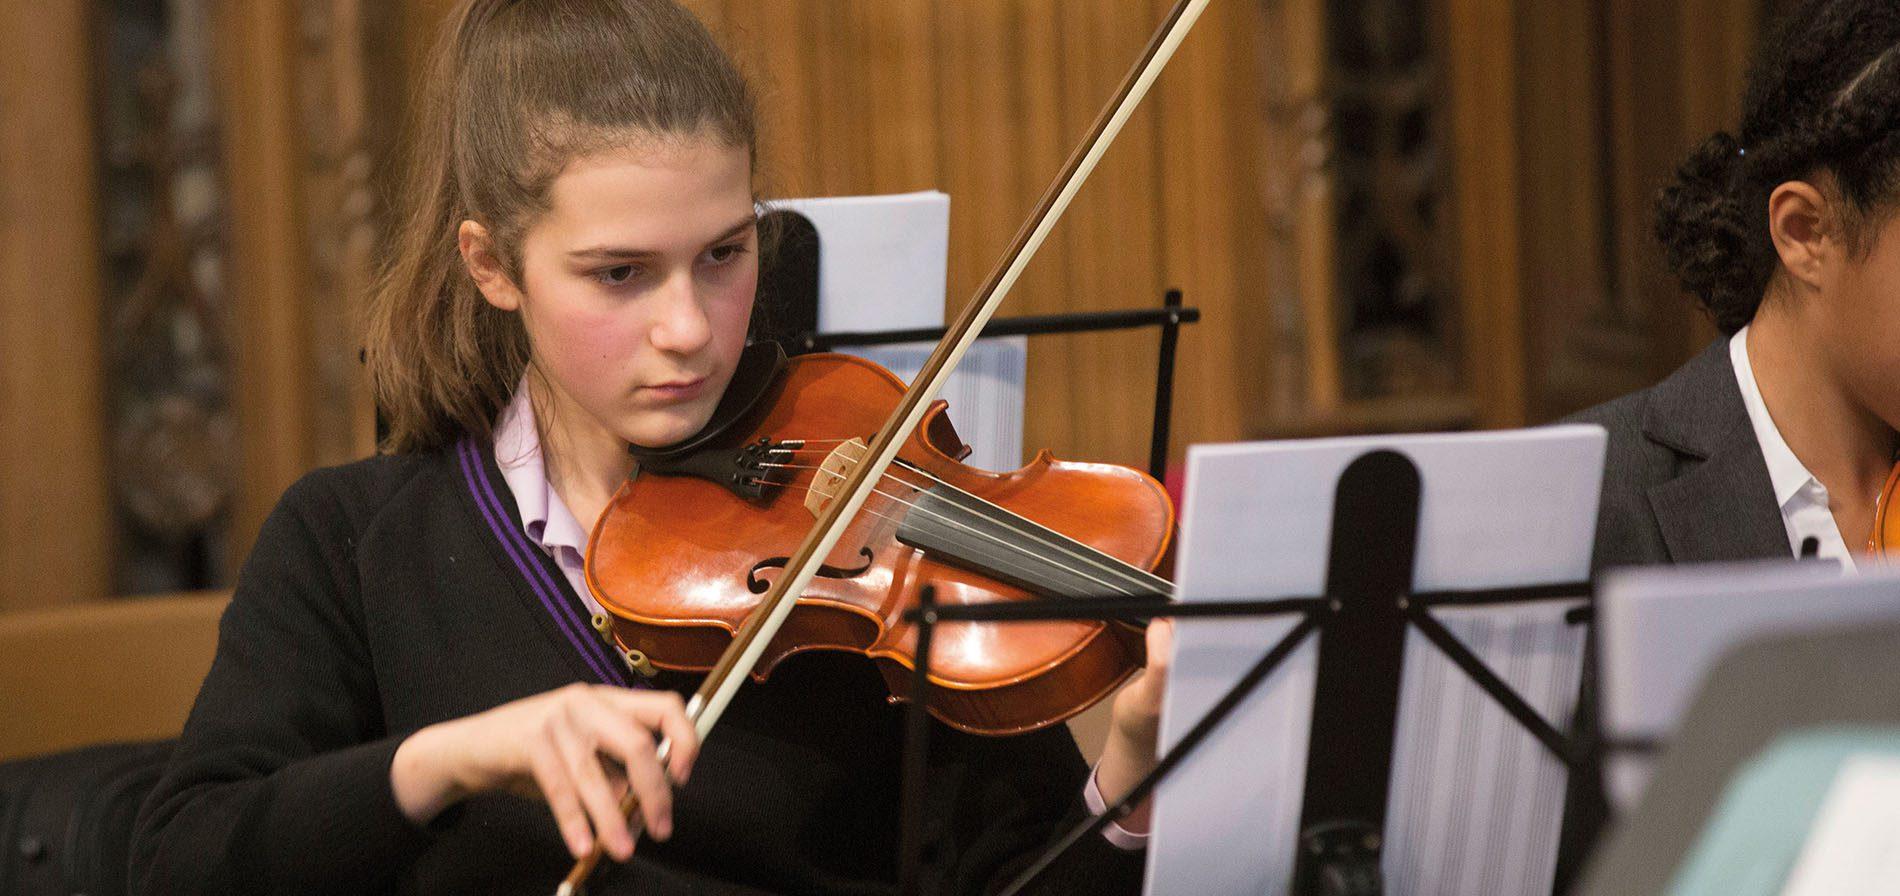 Music Scholarships | Streatham & Clapham High School